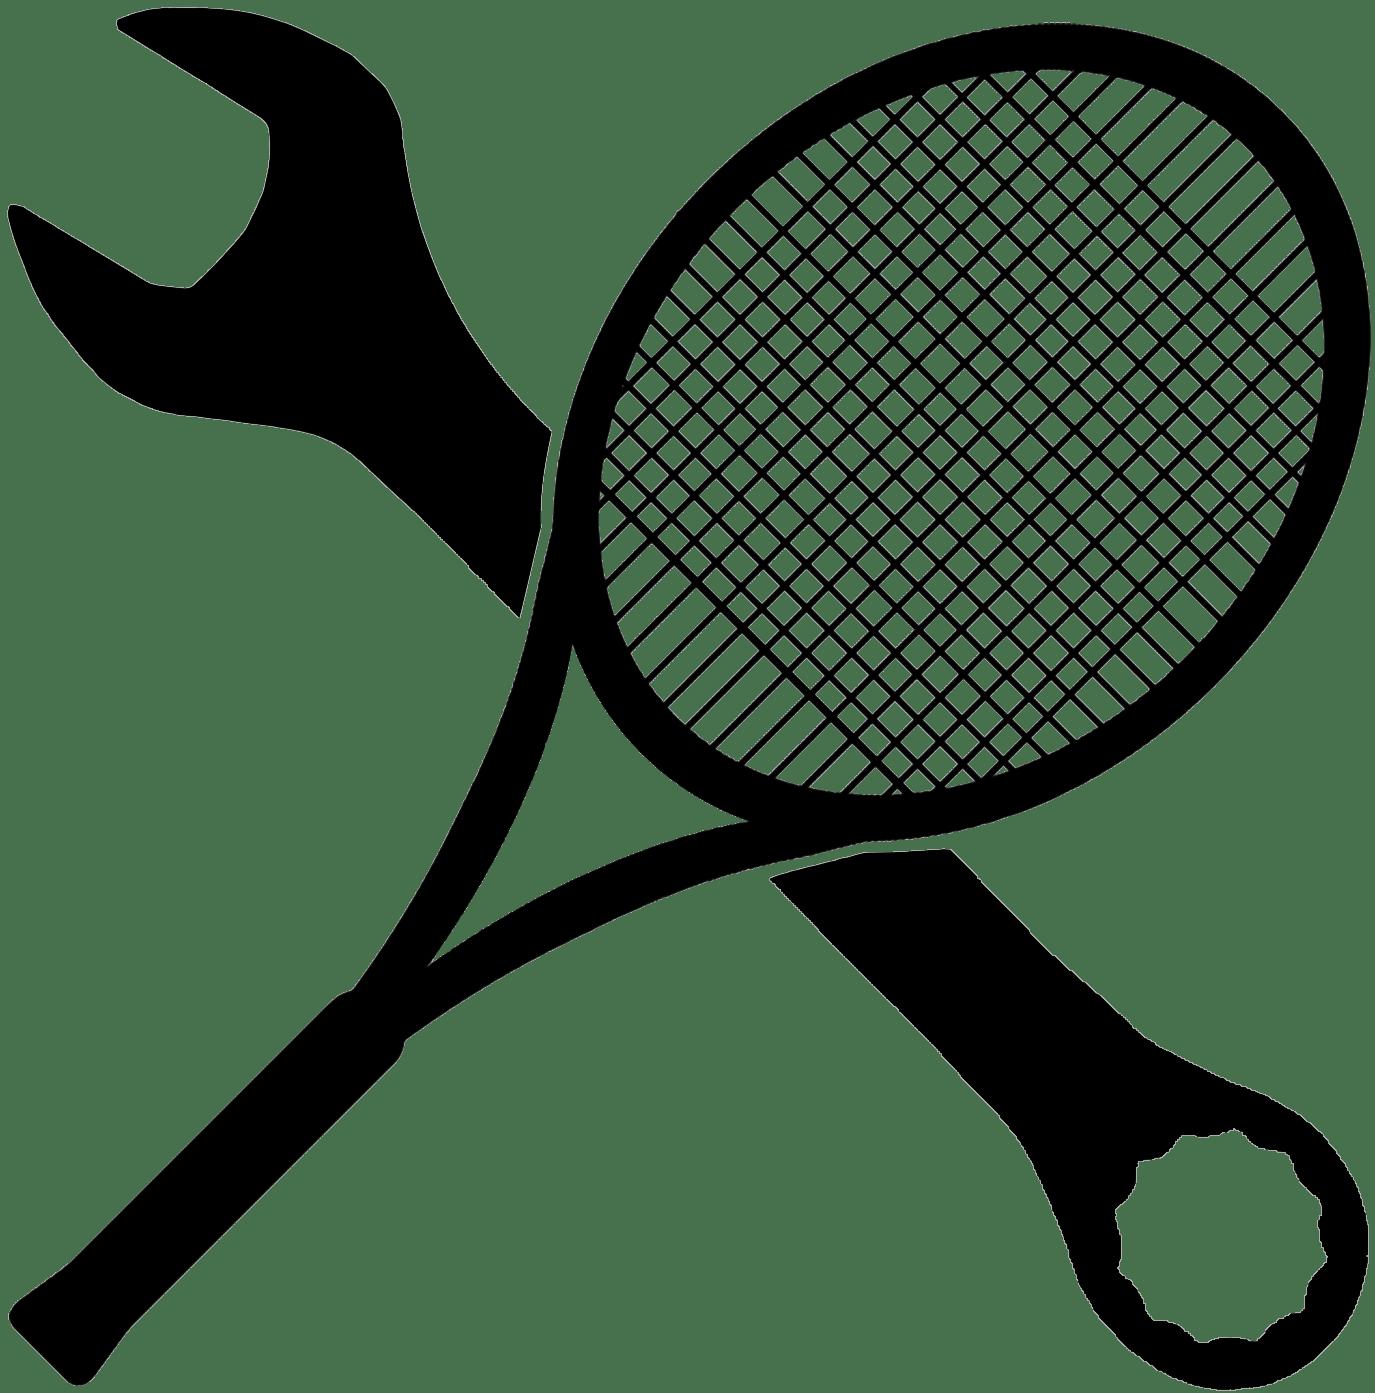 Tennis Racquet Images